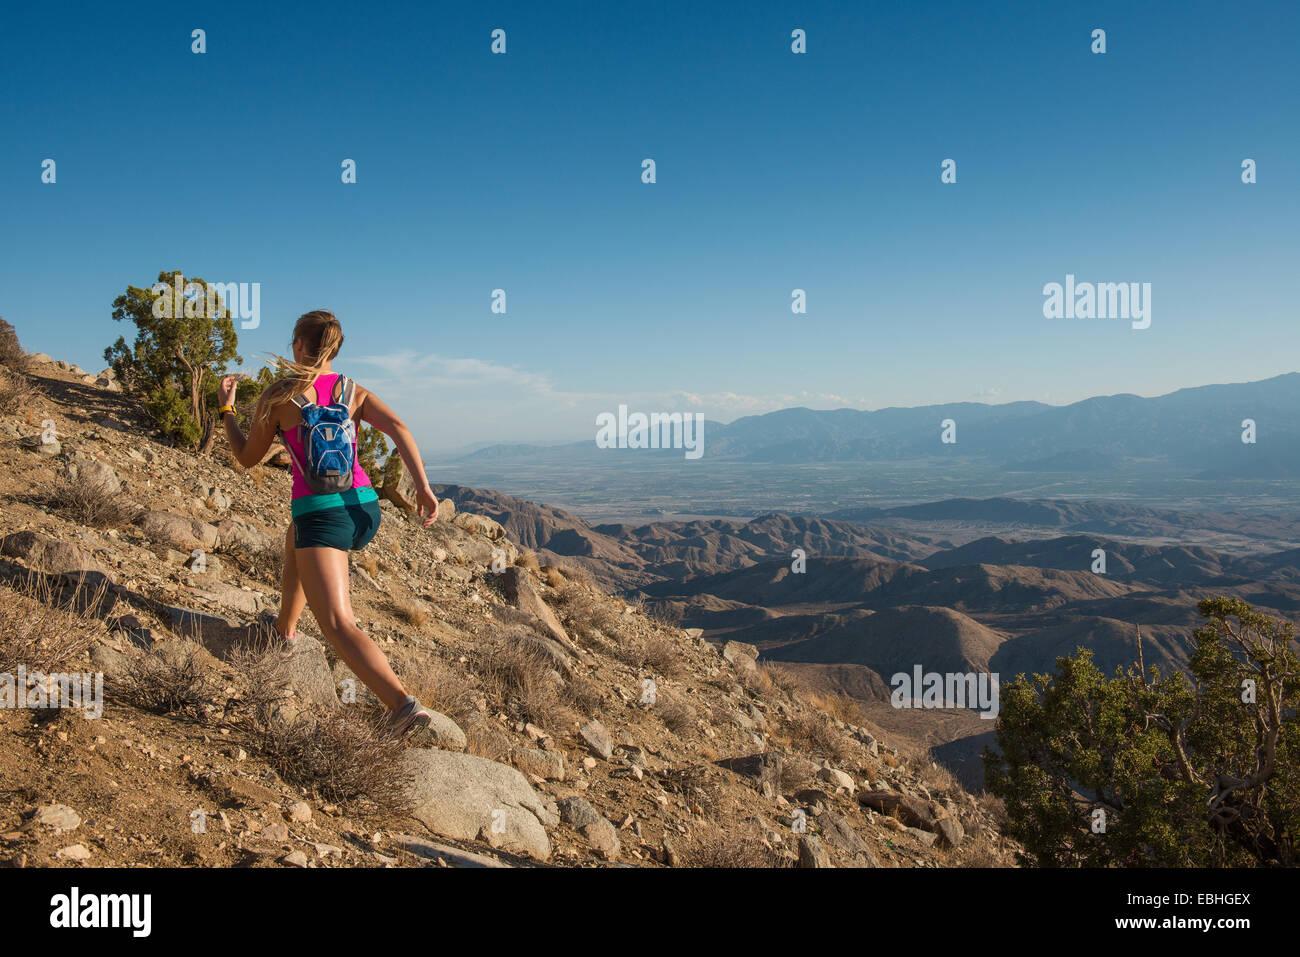 Woman running on mountain, Joshua Tree National Park, California, US - Stock Image